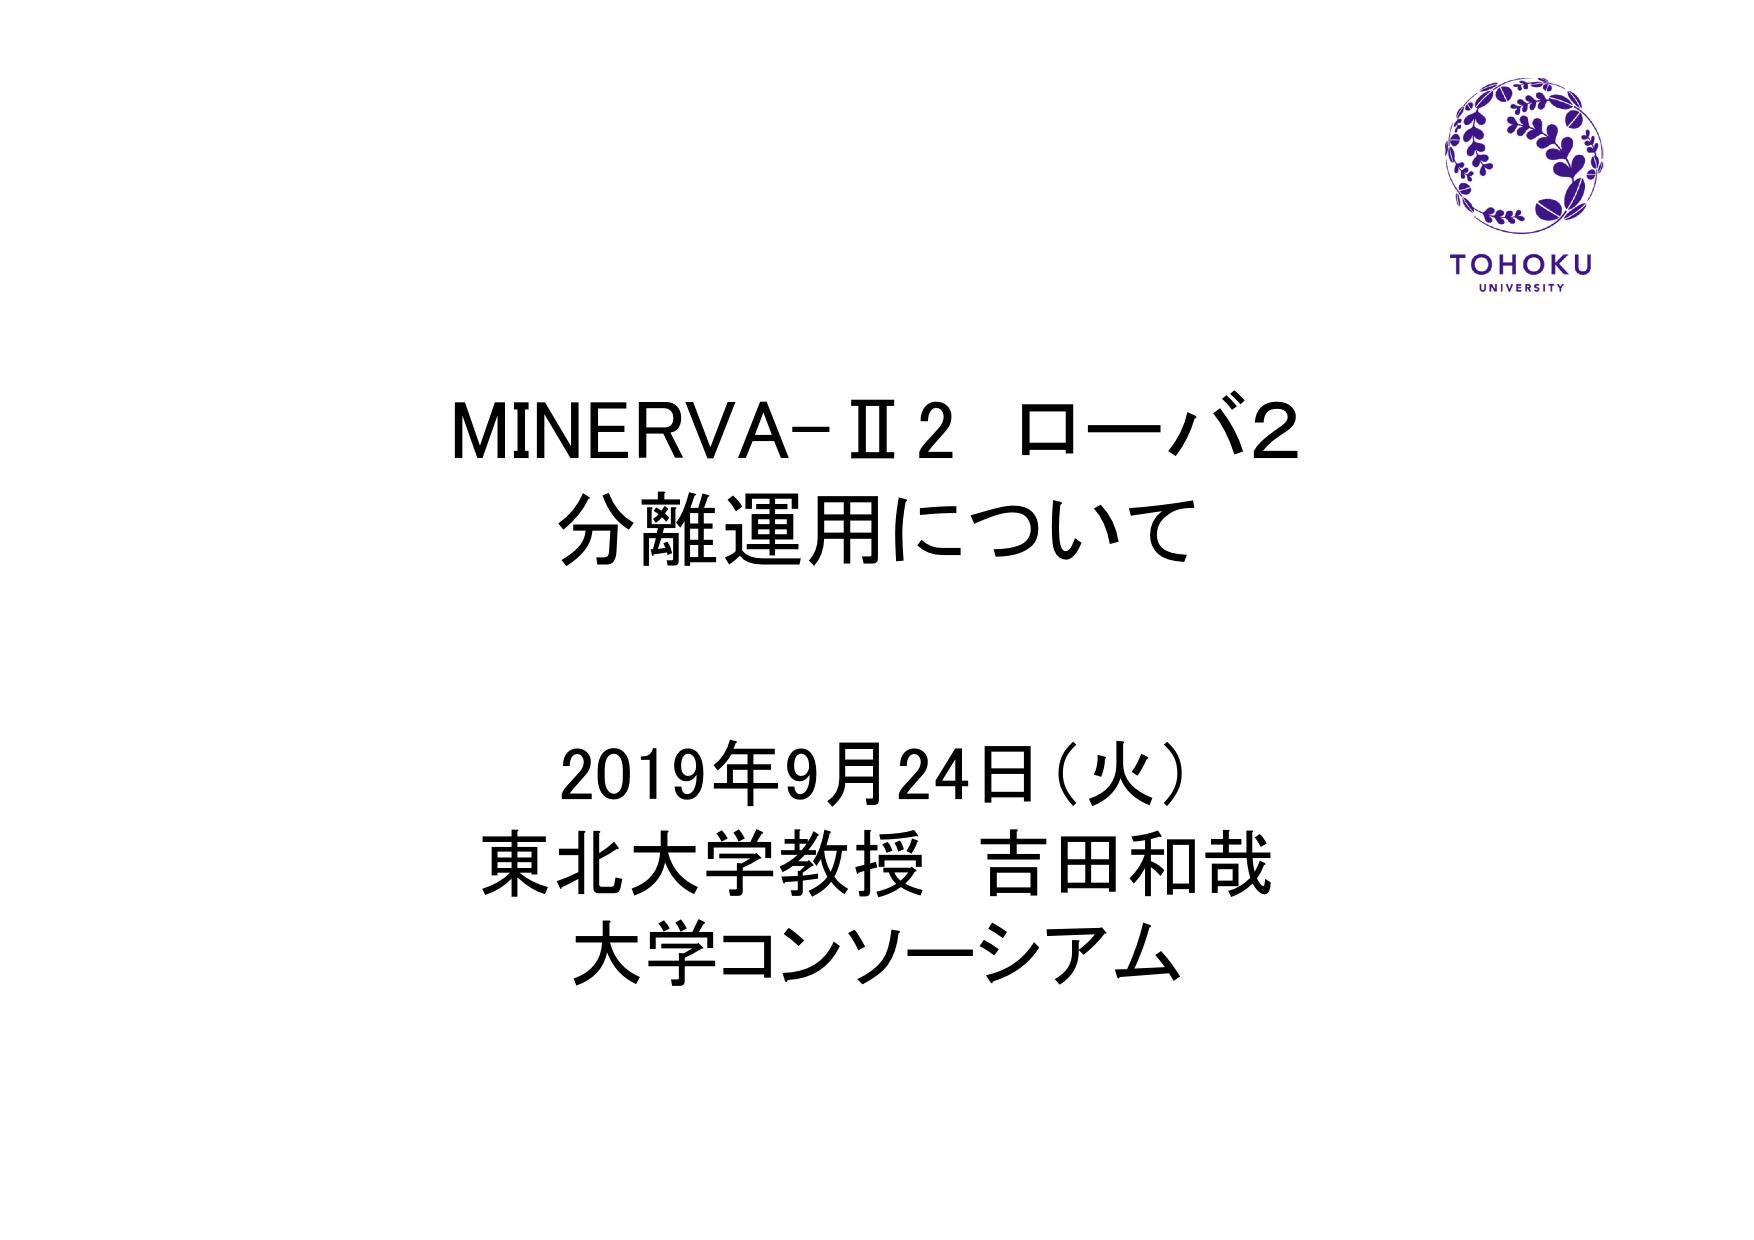 f:id:Imamura:20190924122636p:plain